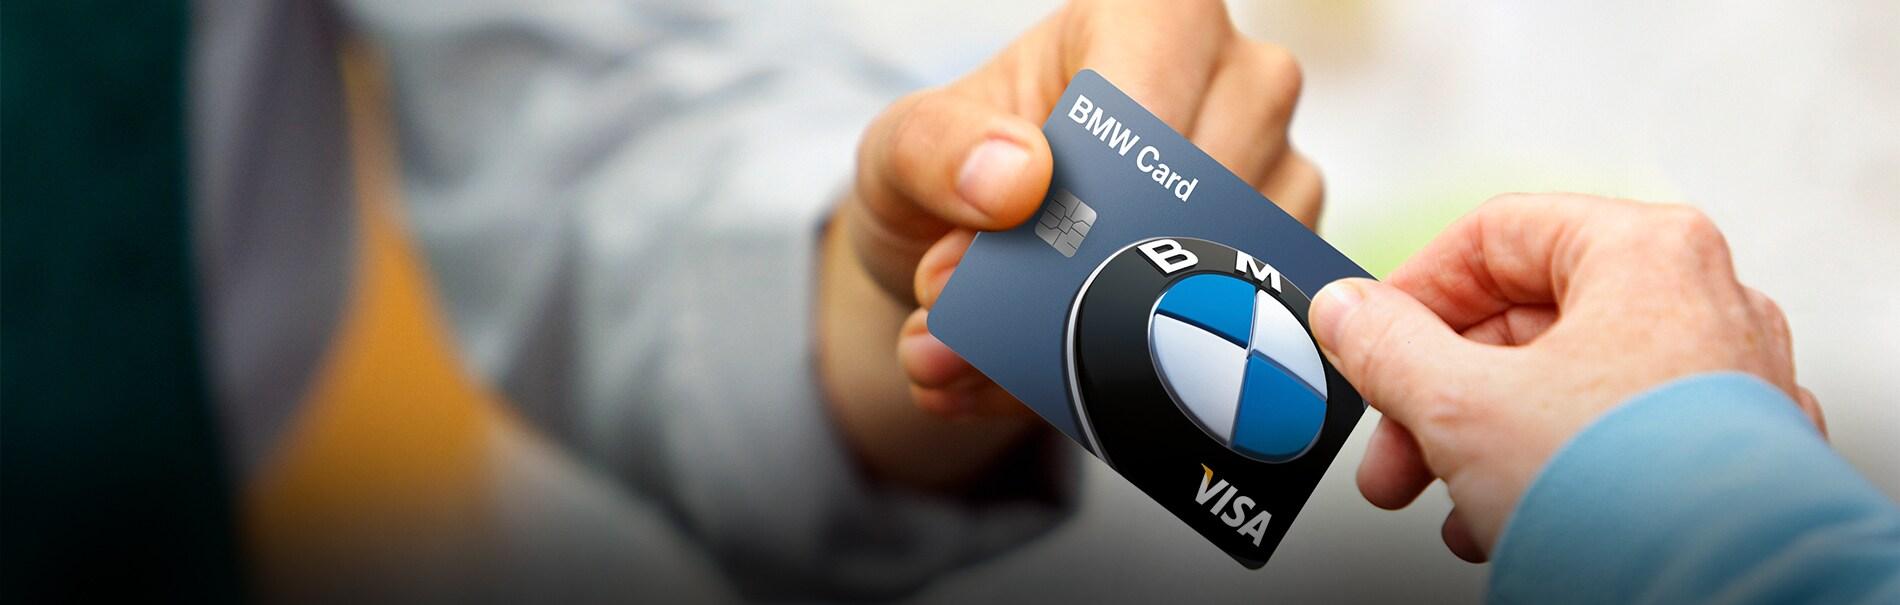 BMW Credit Card Header